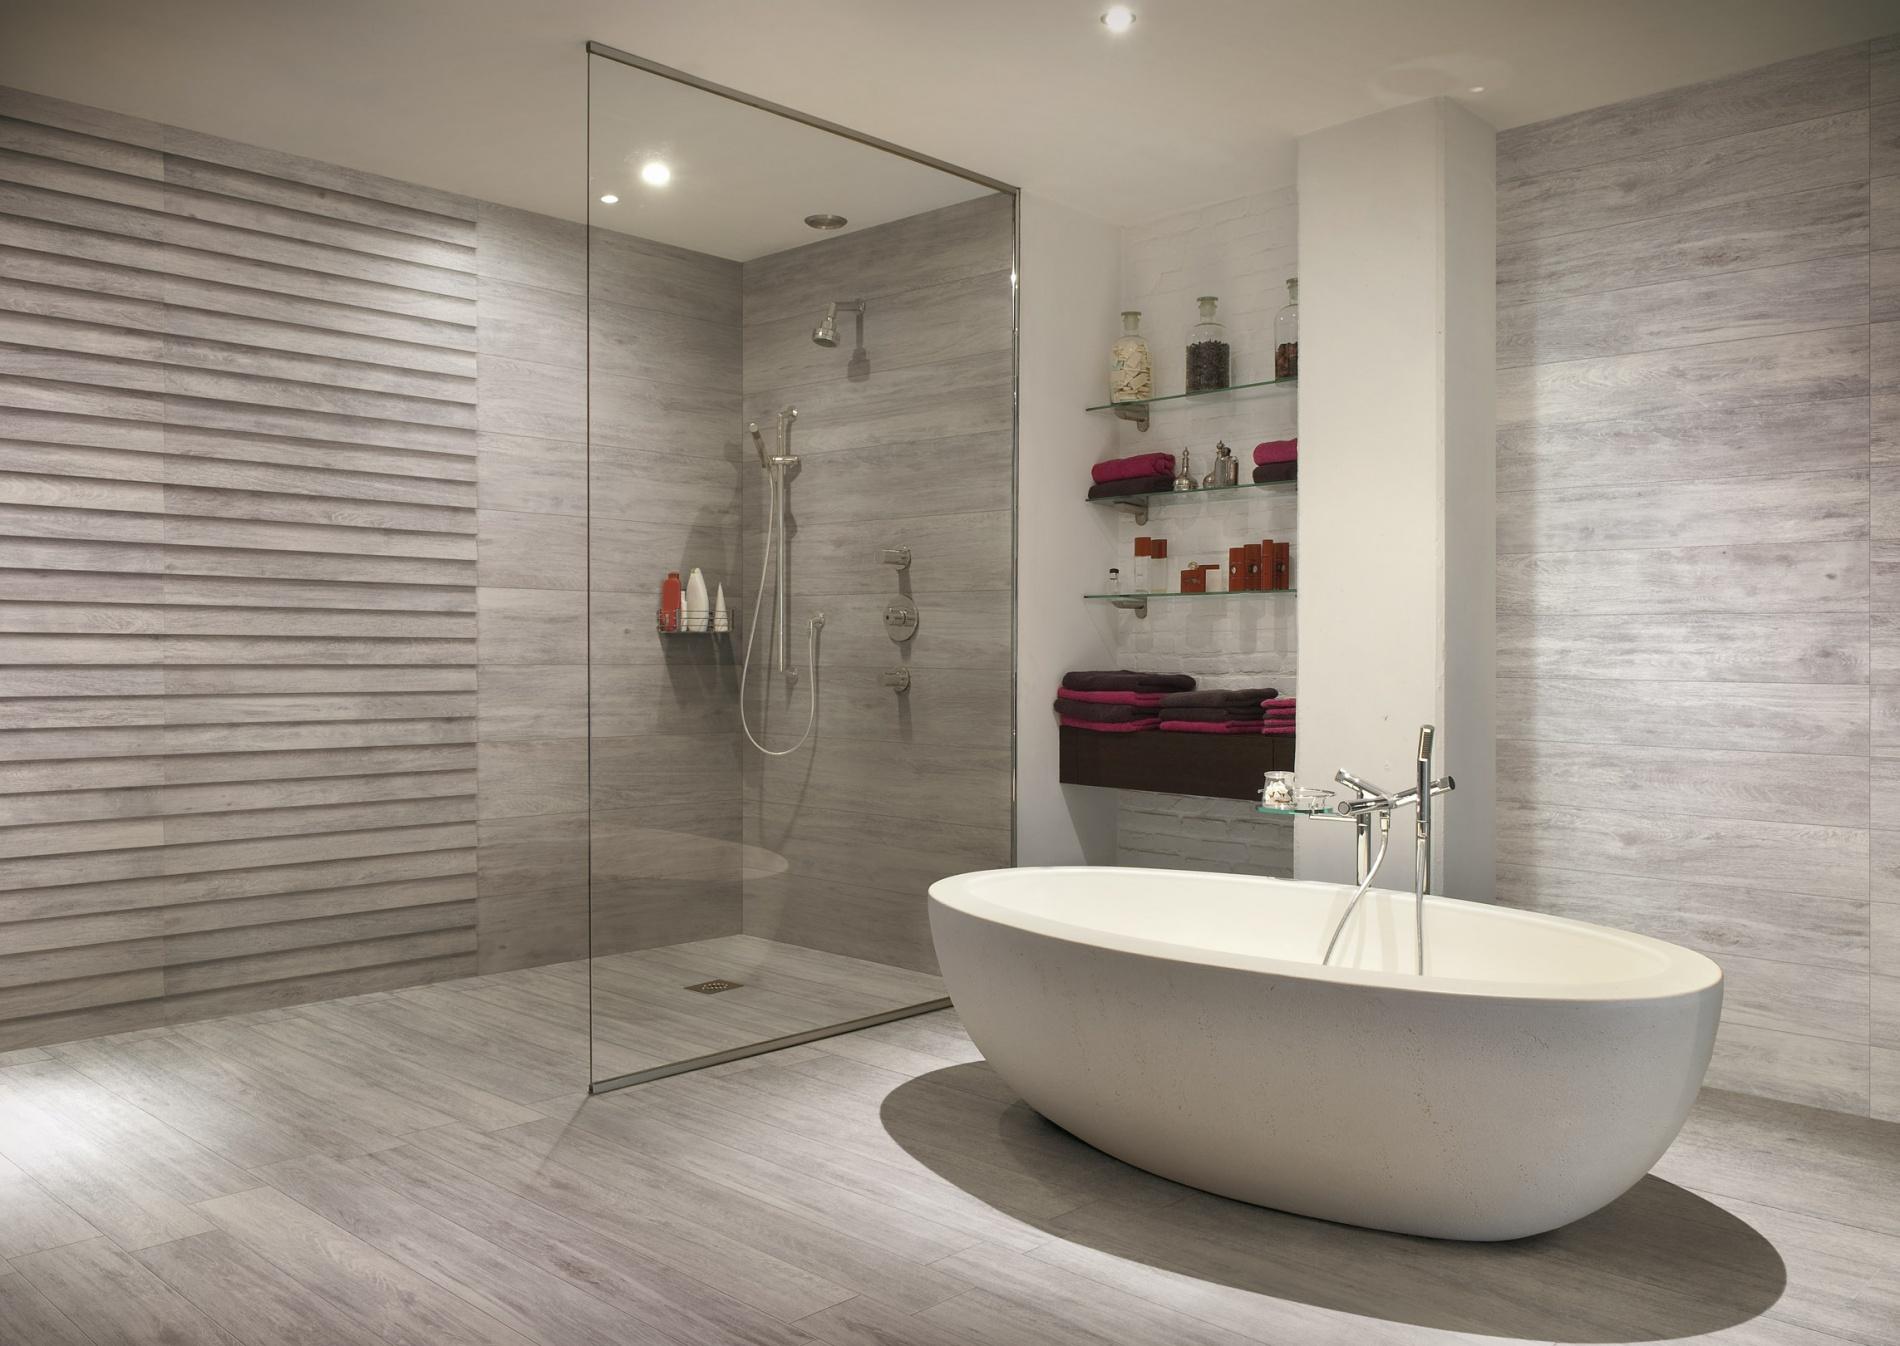 Wet Room Ideas & Wet Room Photos